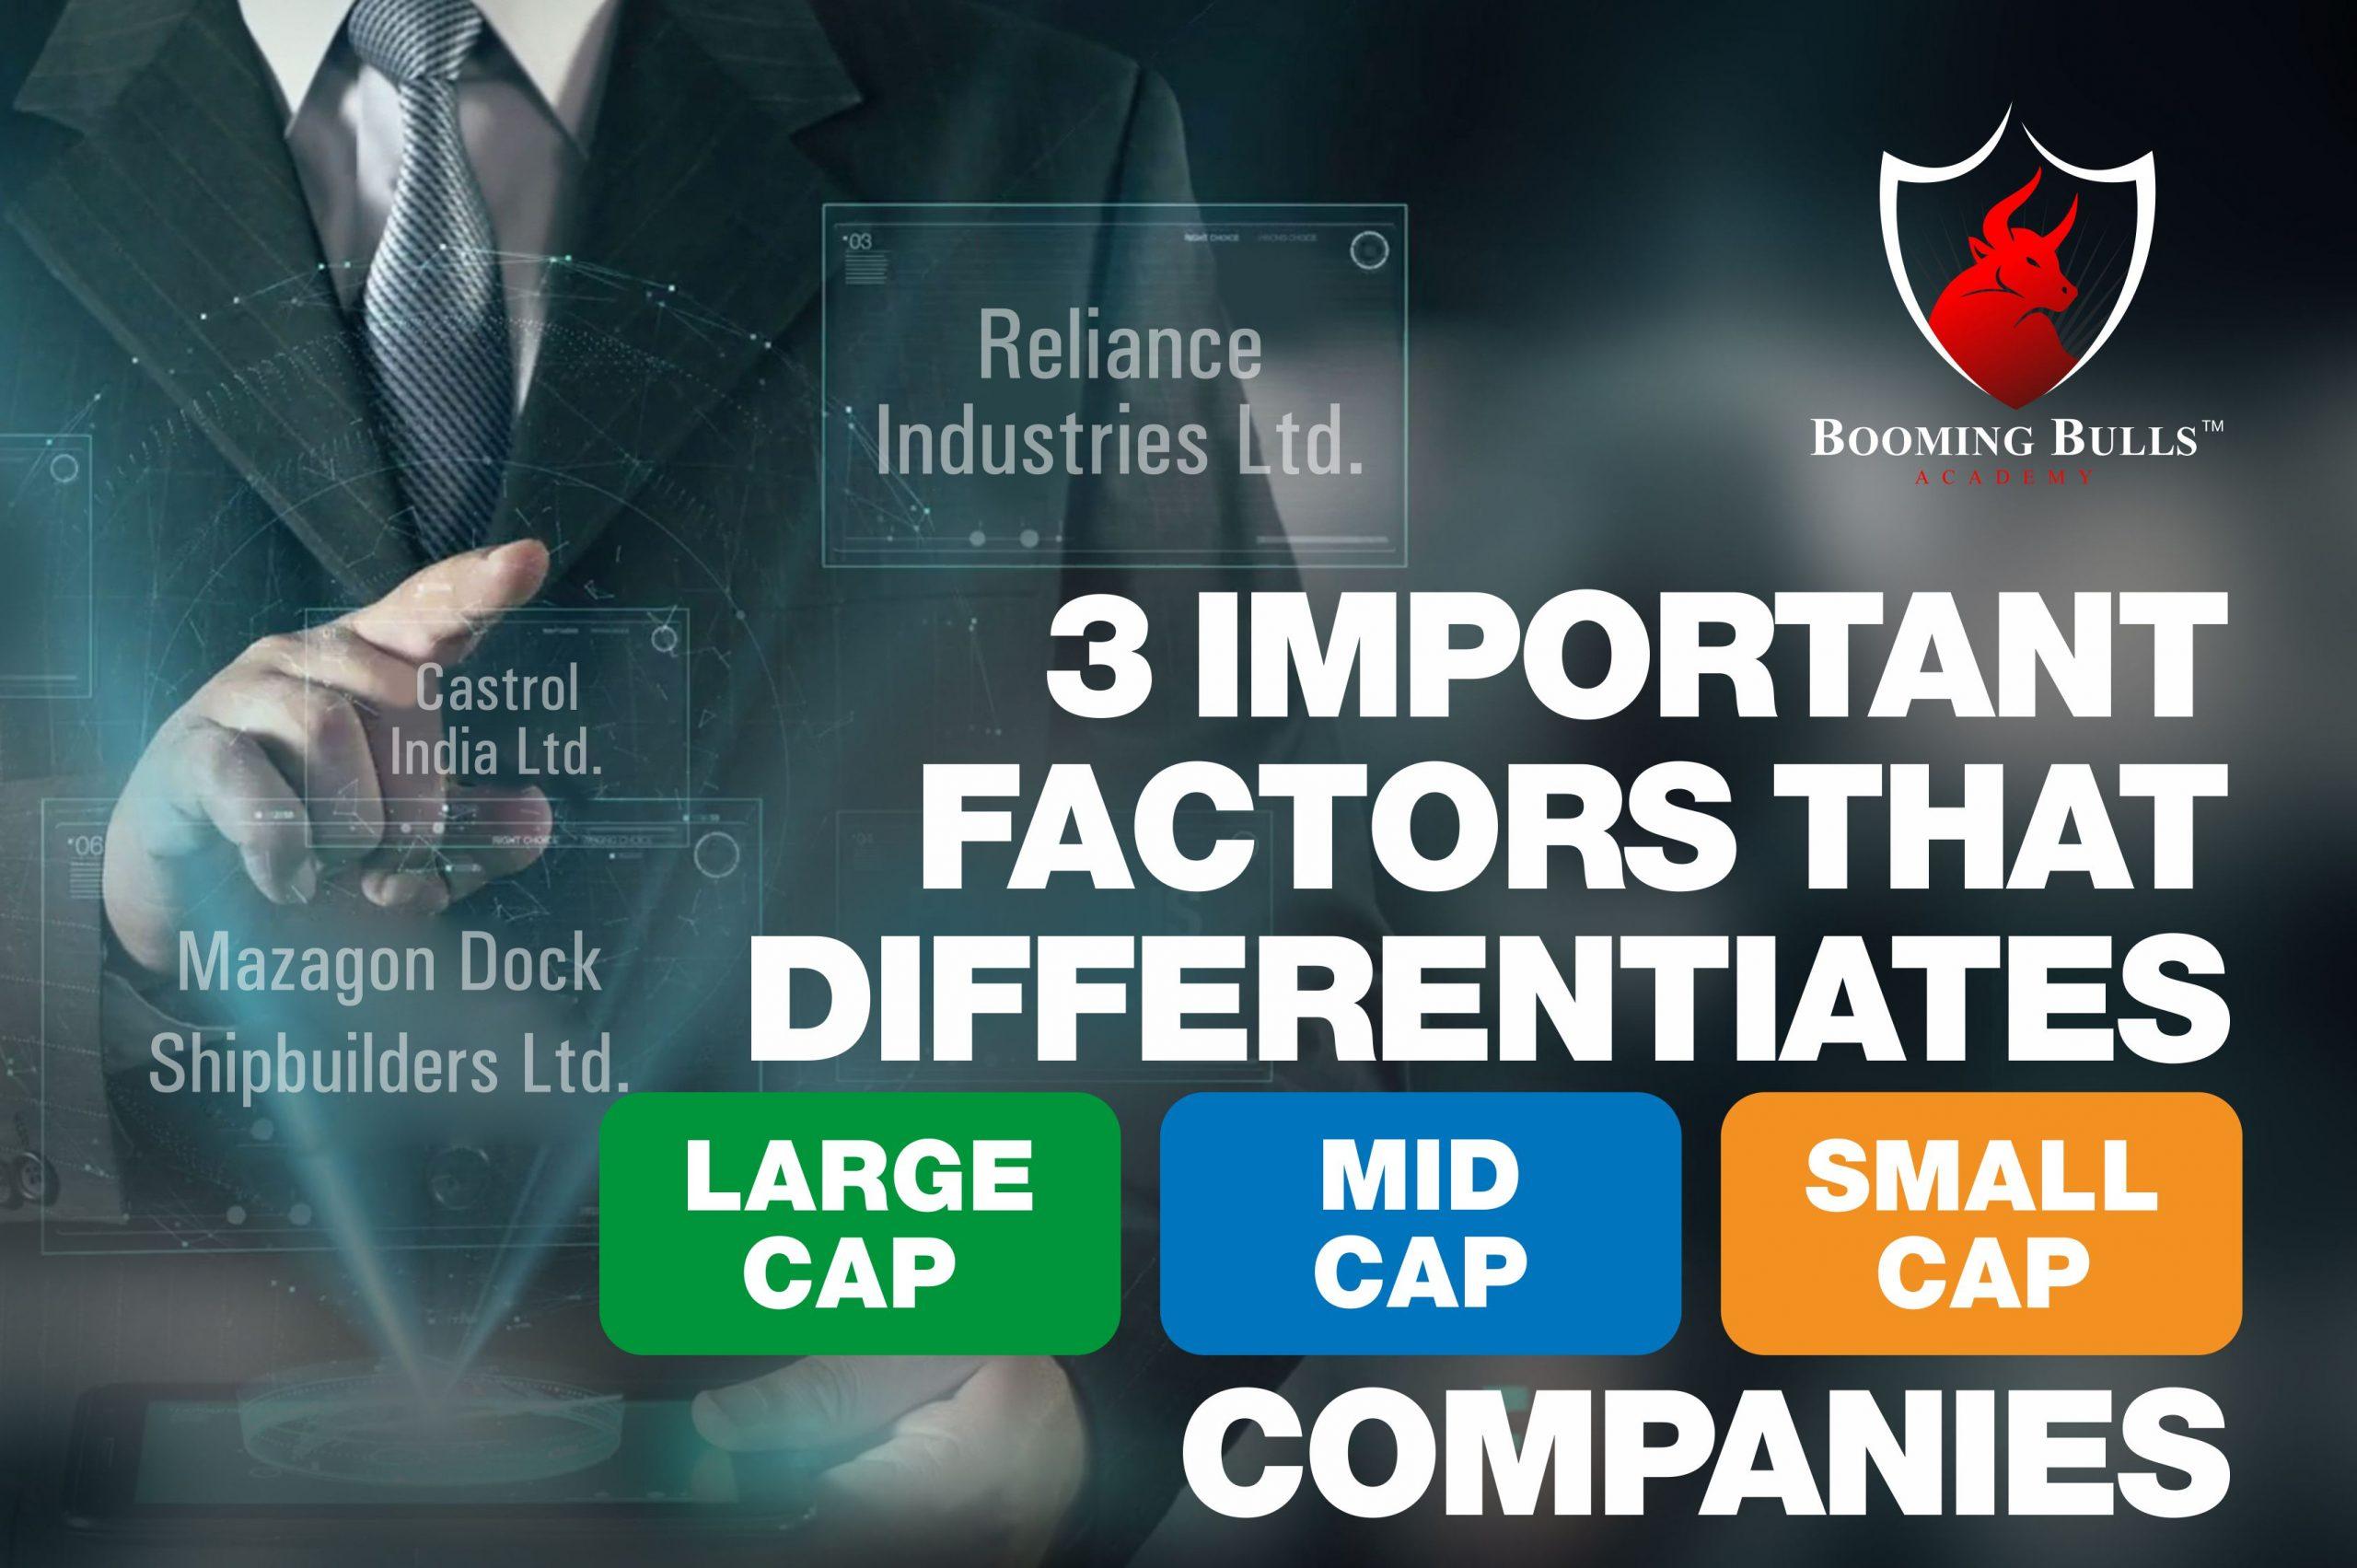 3 Important Factors That Differentiates Large Cap, Mid Cap, And Small Cap Companies